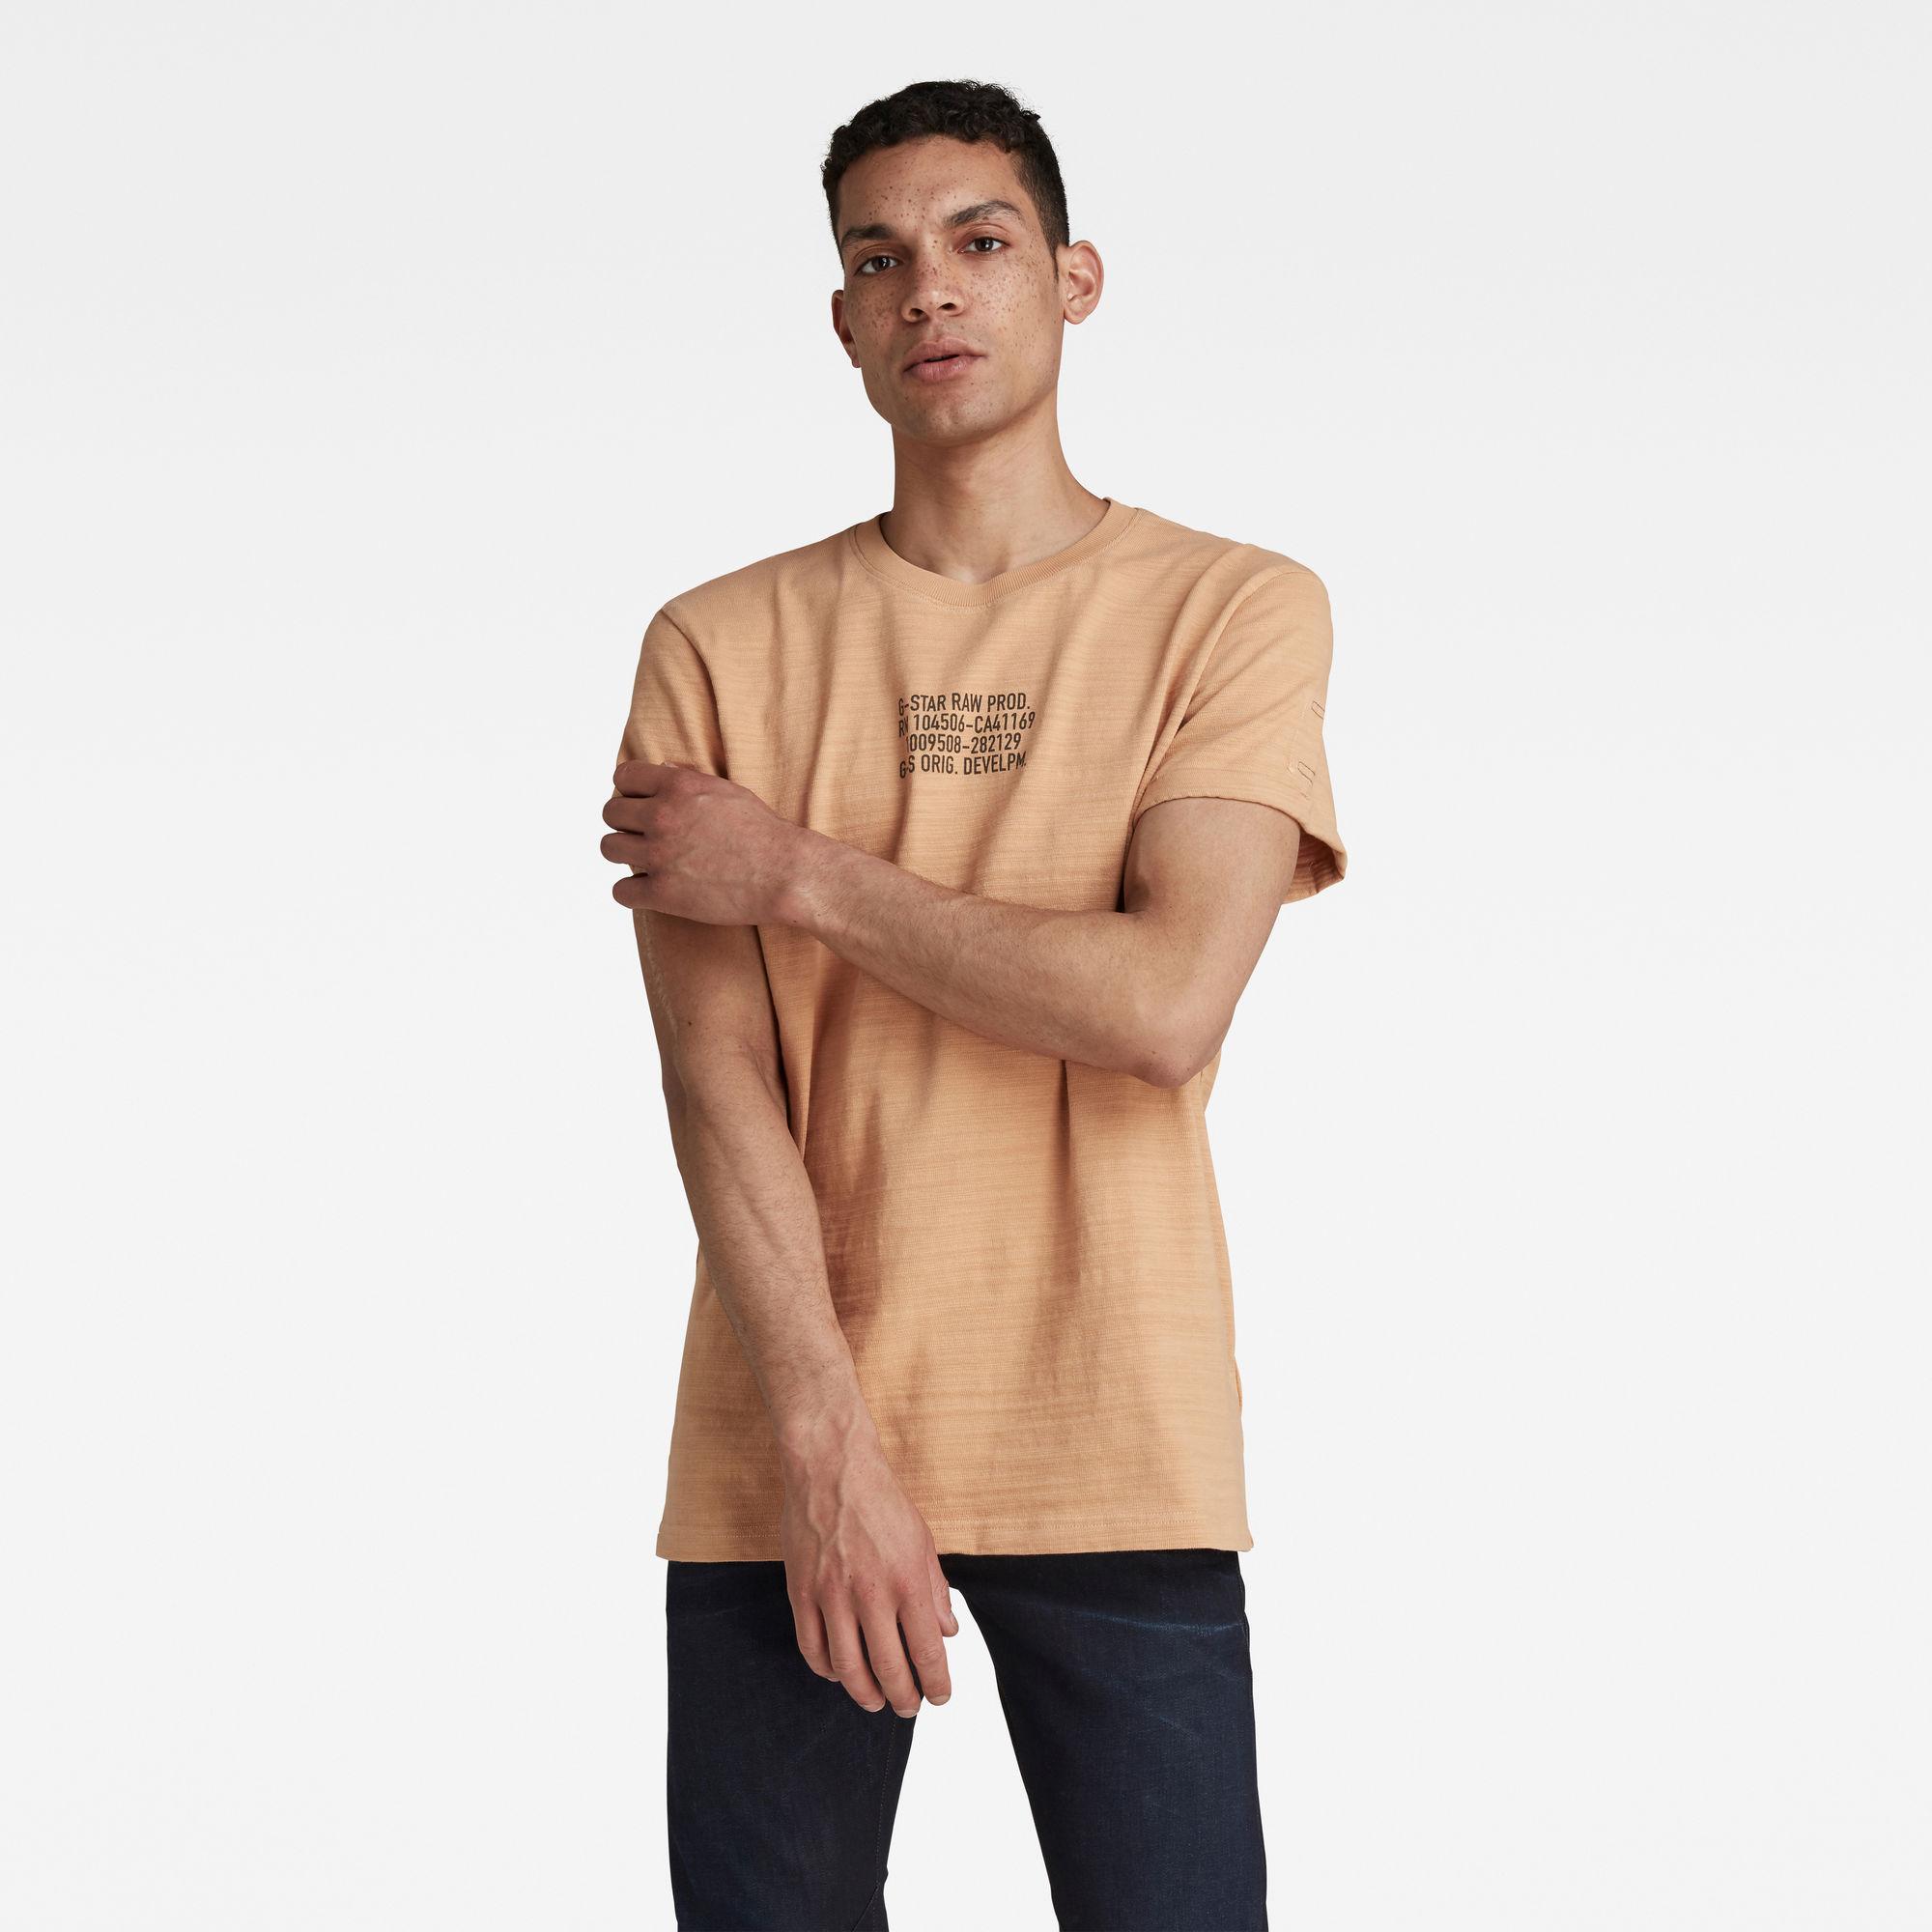 G-Star RAW Heren Chest Text Graphic T-Shirt Roze